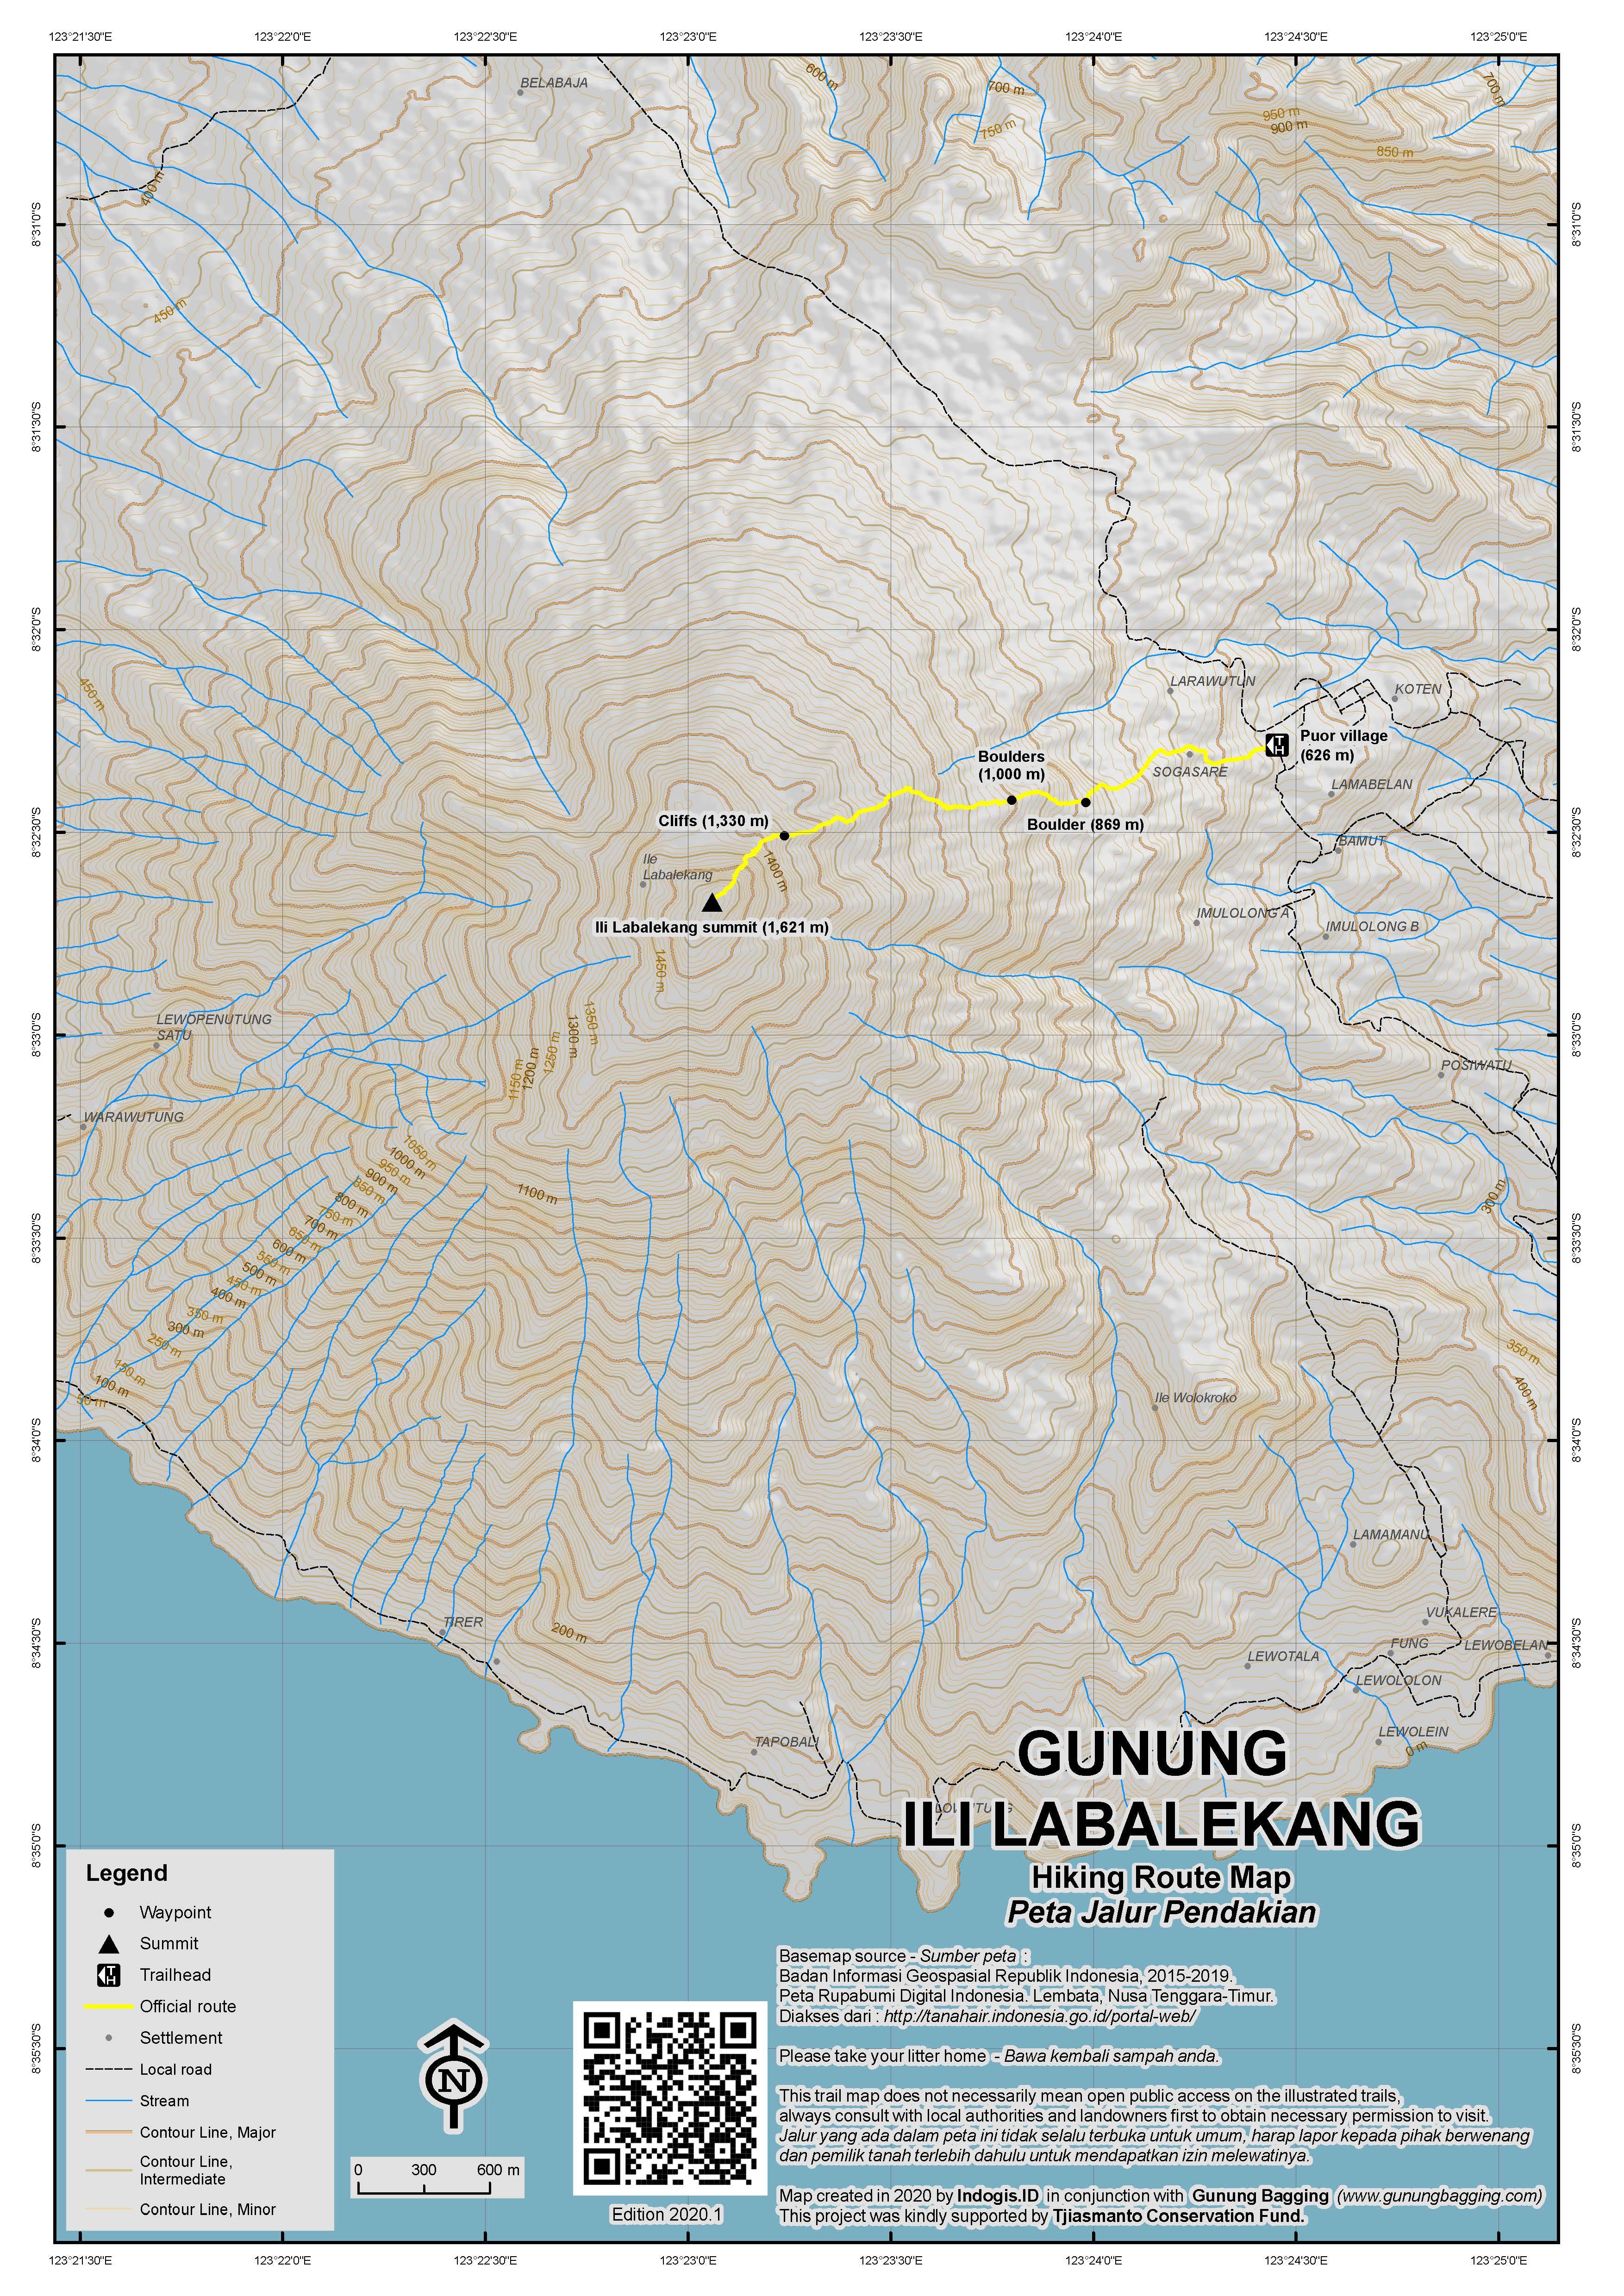 Peta Jalur Pendakian Ili Labalekang